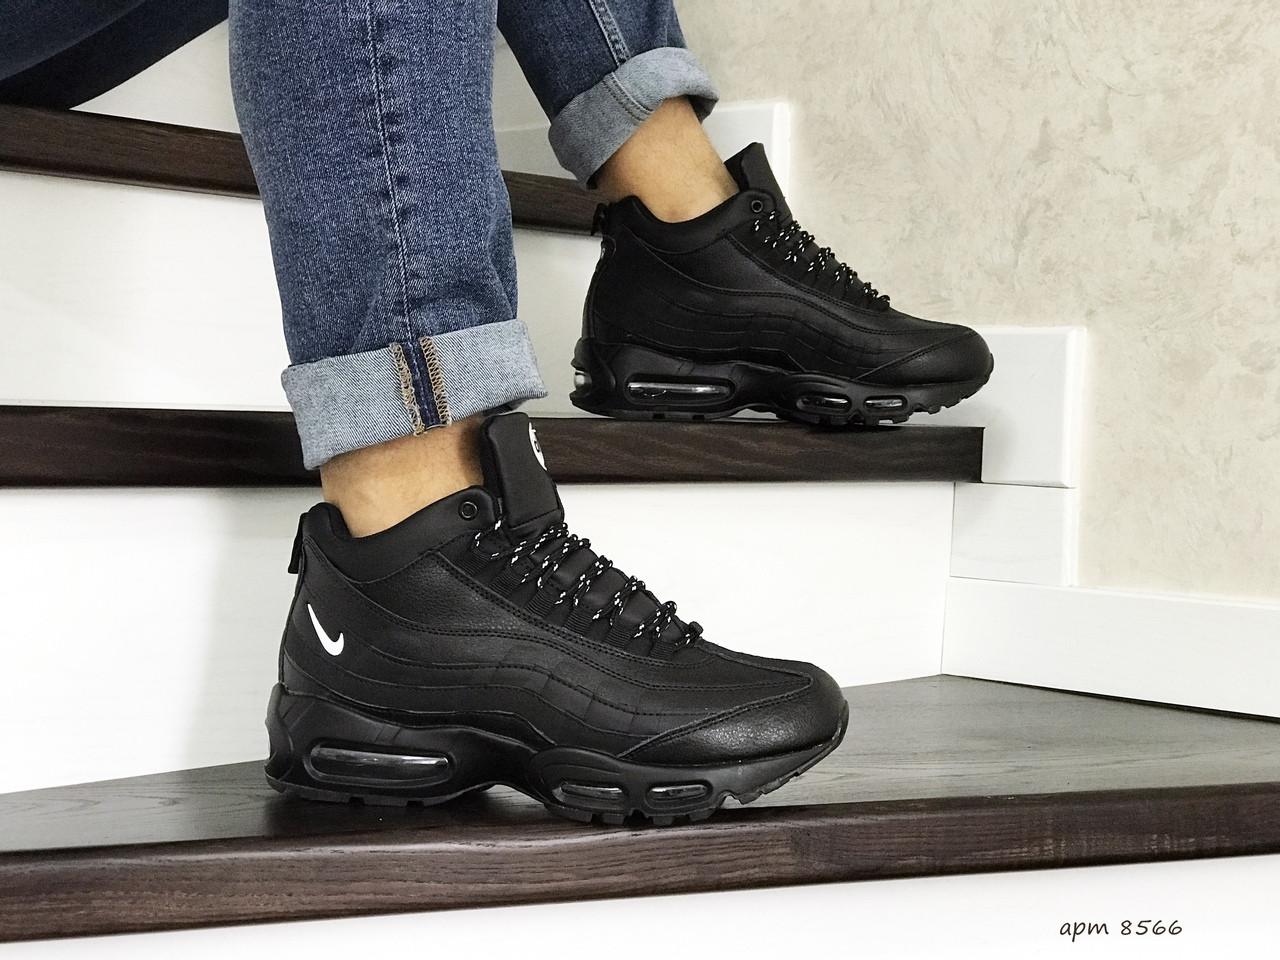 Кроссовки NIKE , Nike 95 кроссовки мужские .ТОП КАЧЕСТВО!!! Реплика